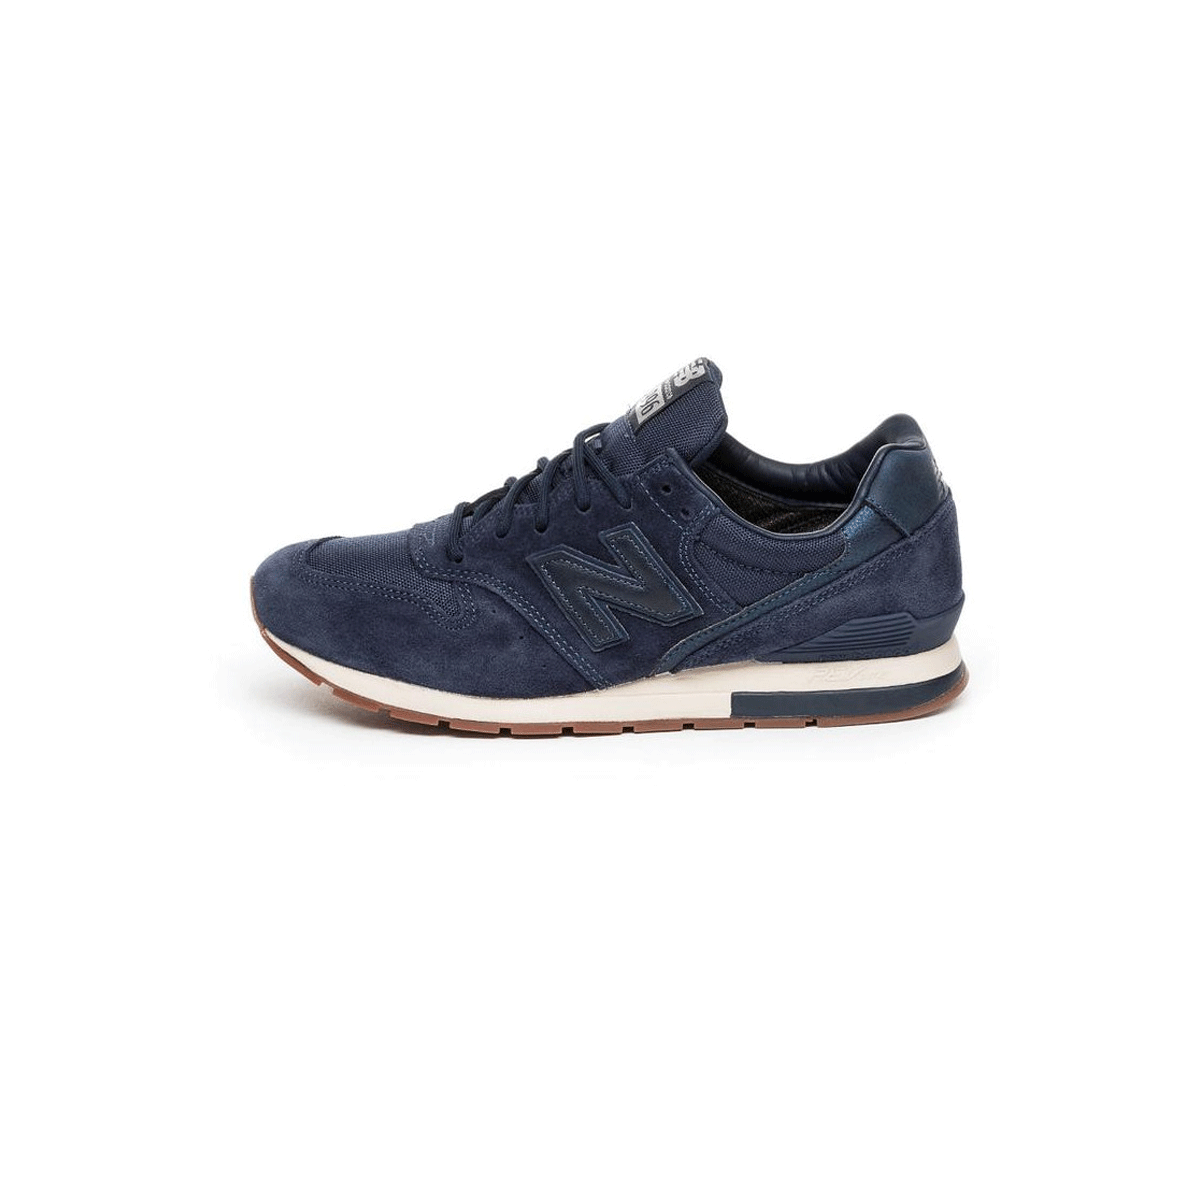 Marine 996 Balance Chaussures Sneakers Revlite Homme Mrl996se New 2YDHE9IW